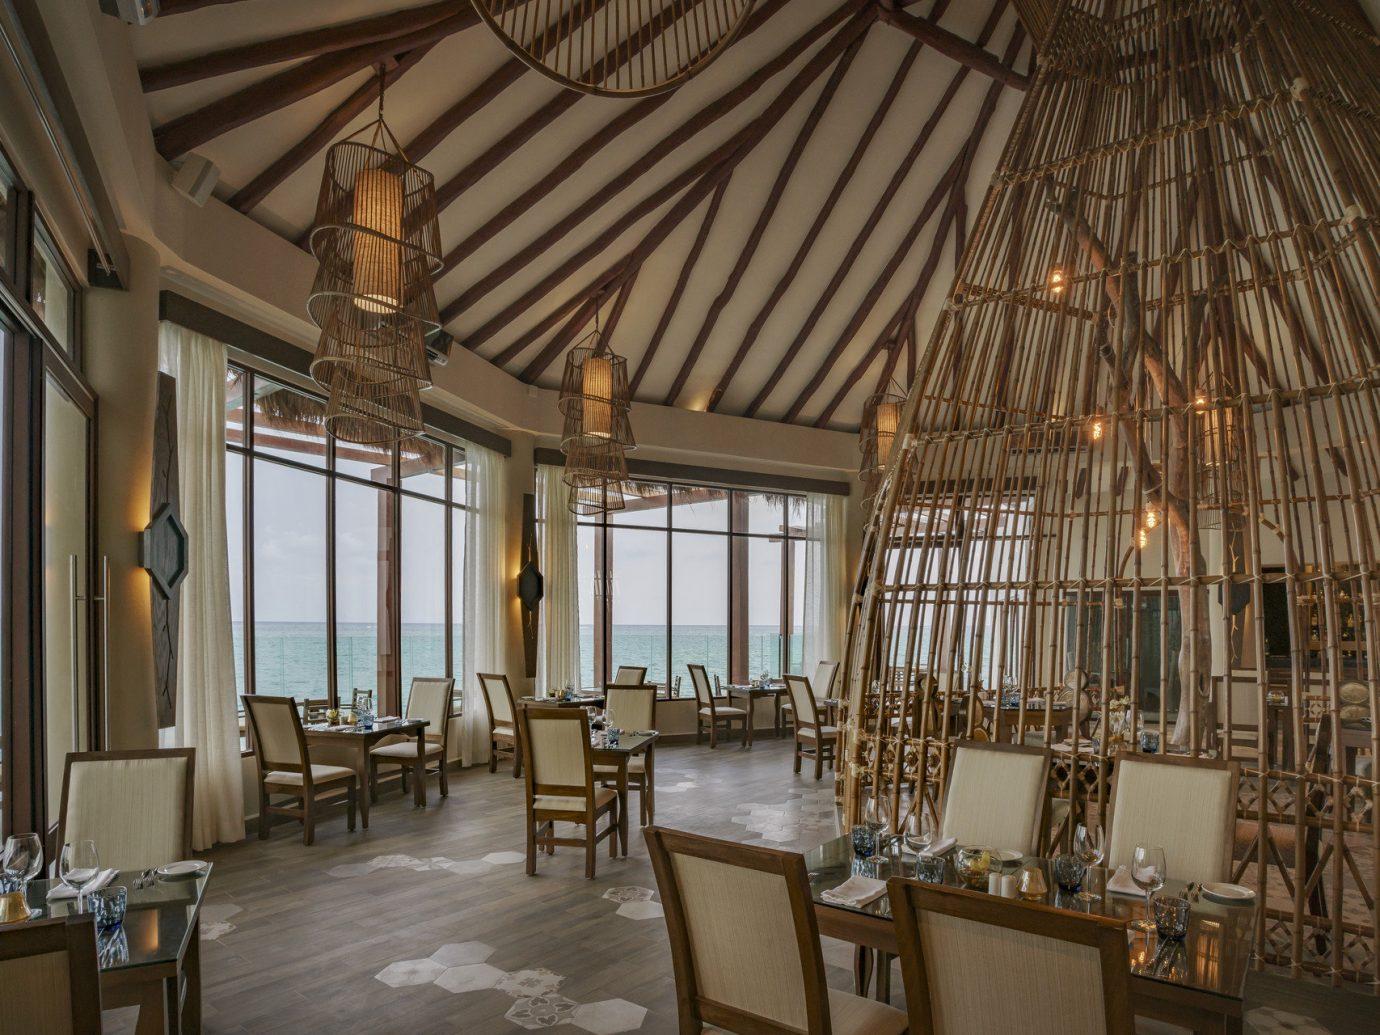 Hotels indoor room floor property window building ceiling estate interior design restaurant Resort furniture several